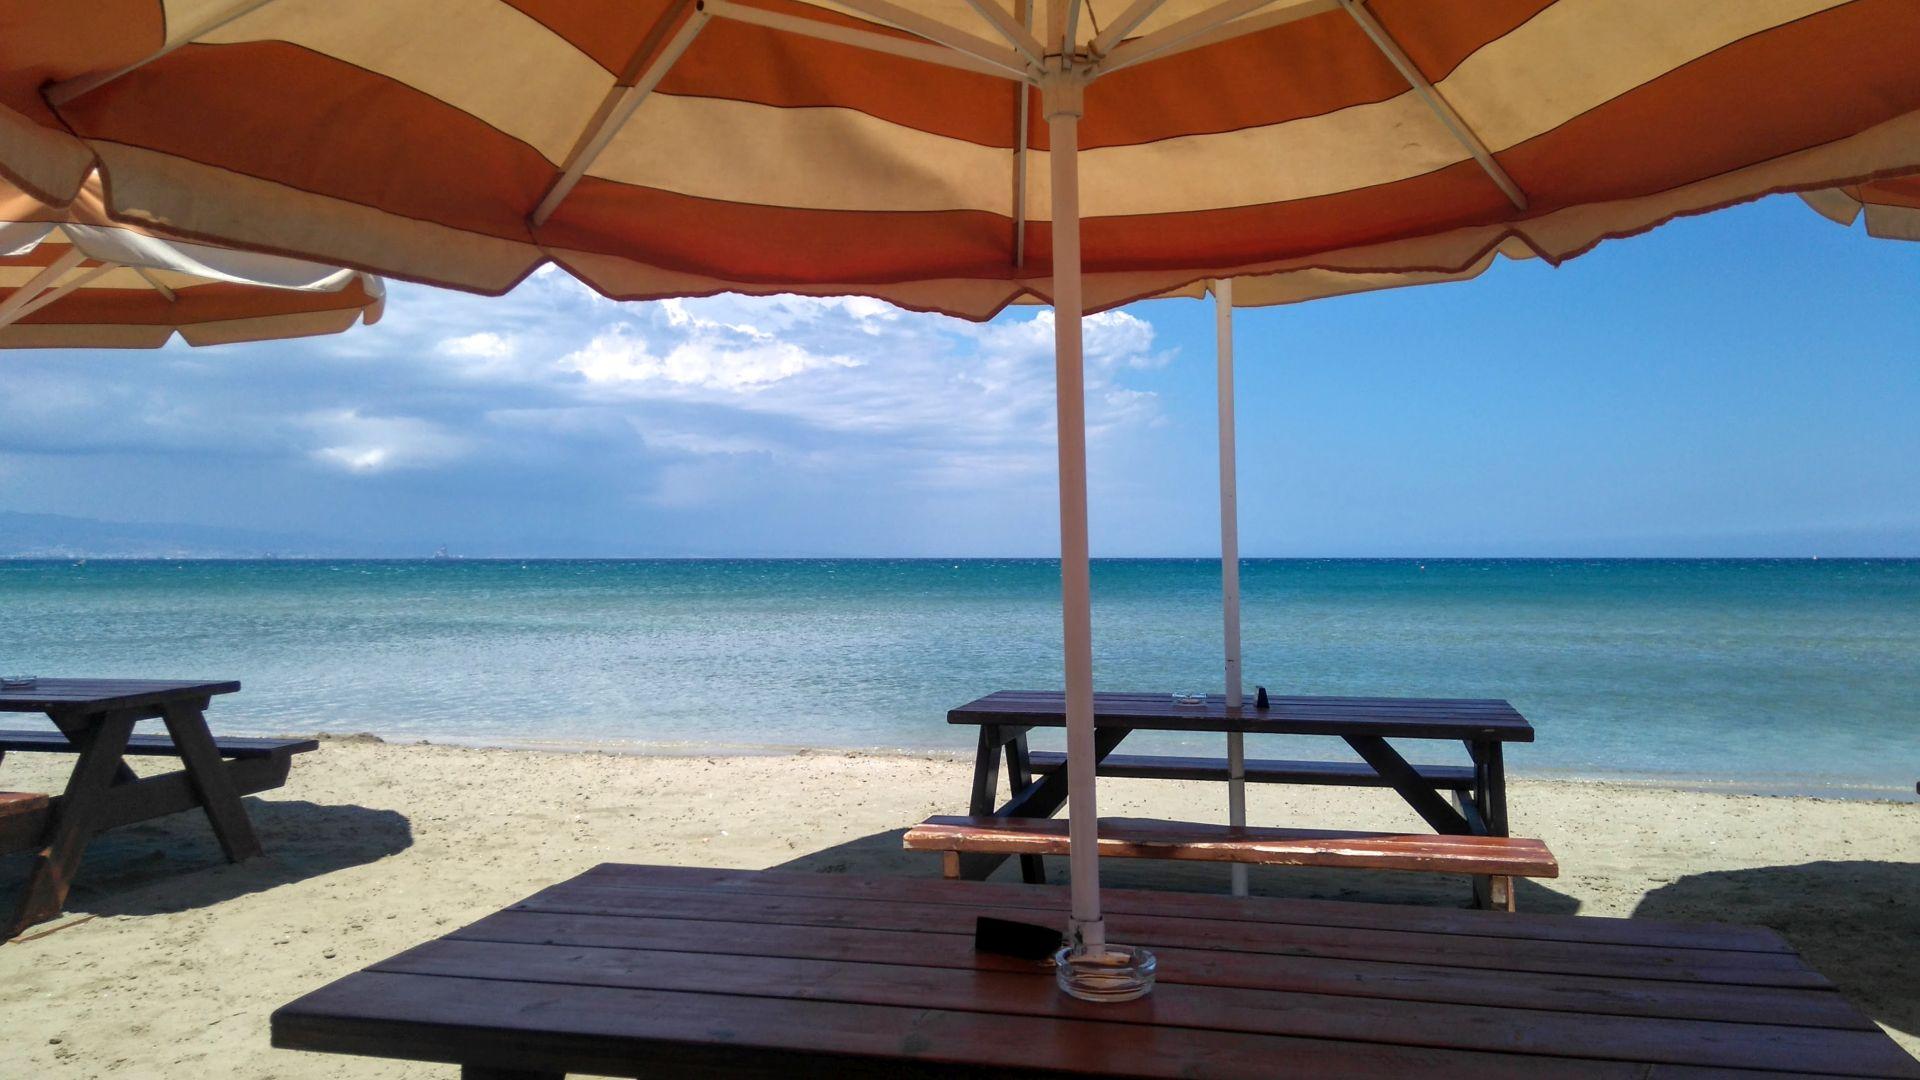 Cypr - Plaża Ladys Mile